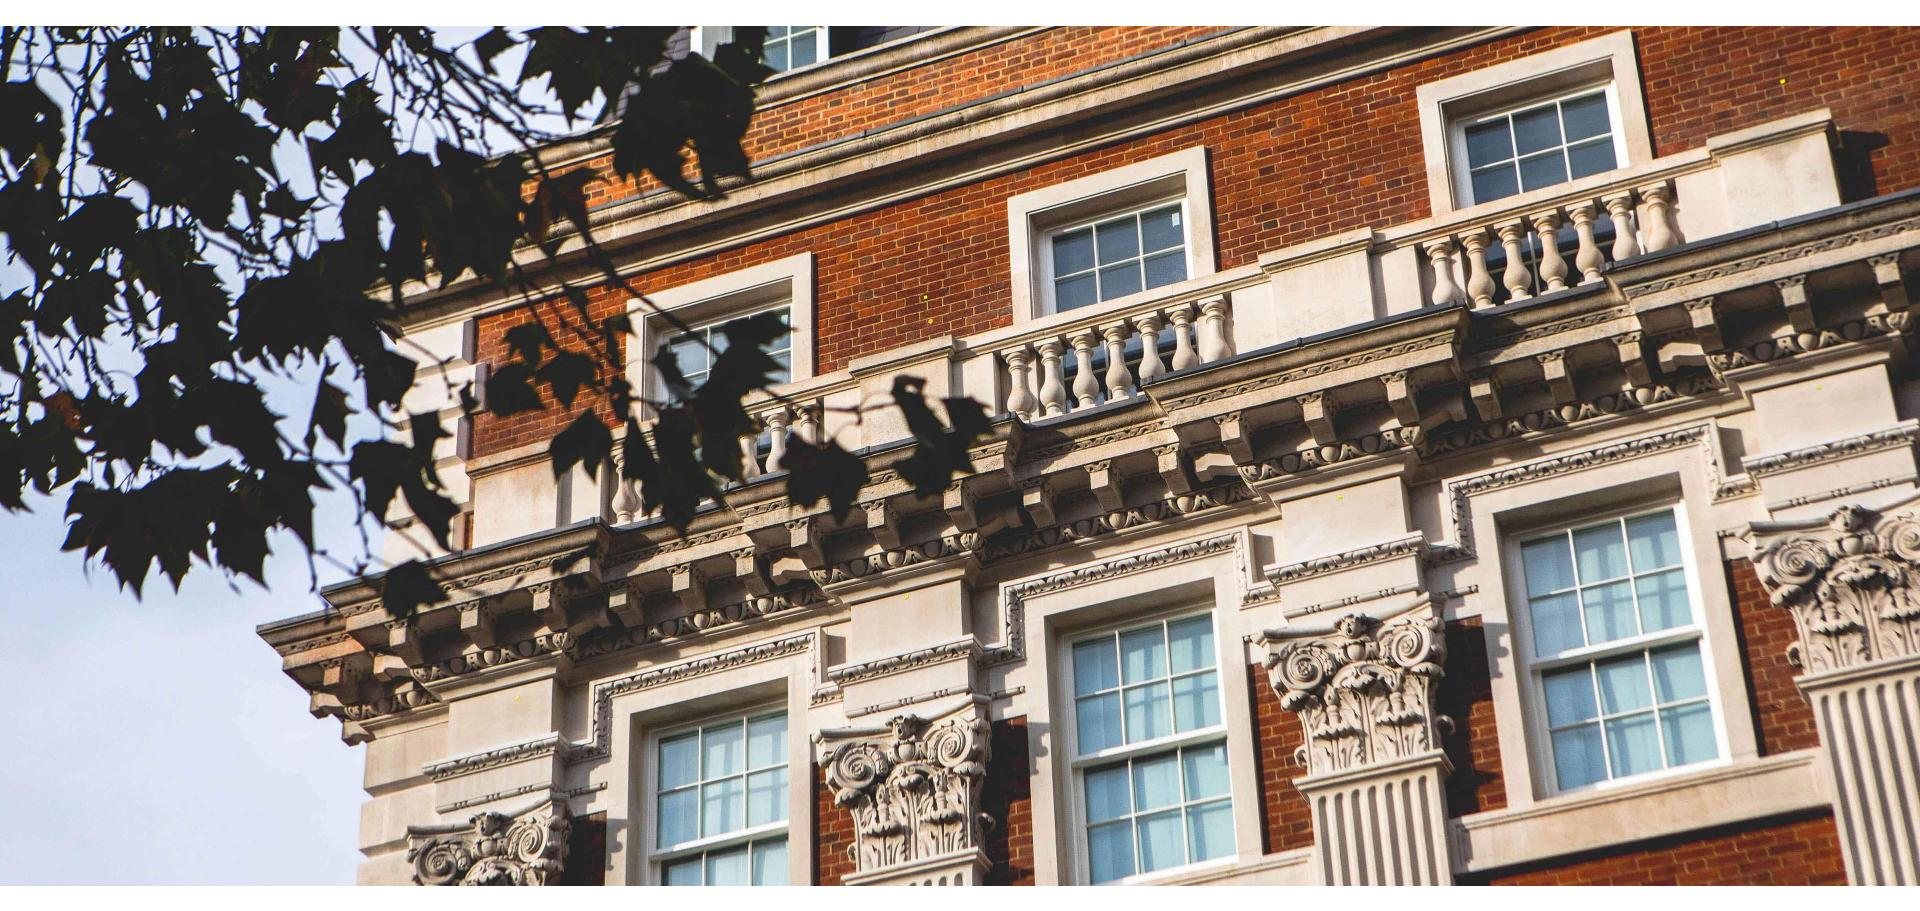 Copy of 20 Grosvenor Square